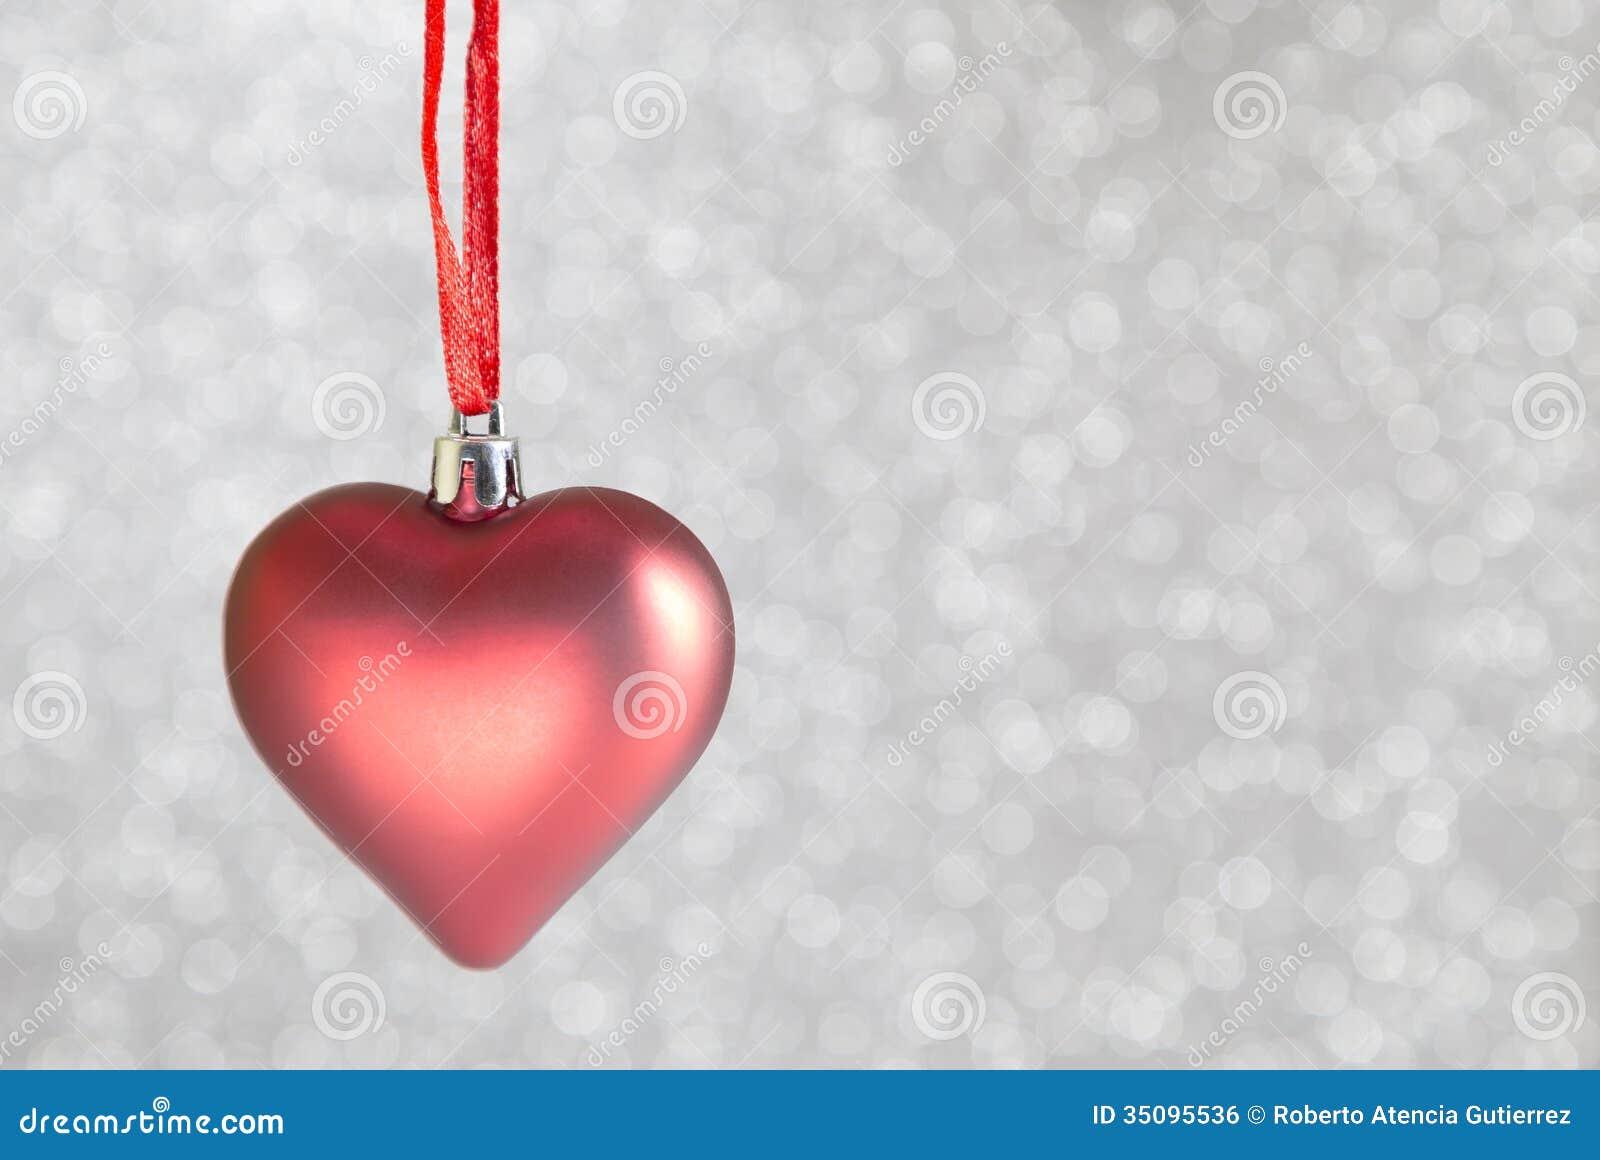 Christmas ornaments heart shaped stock photo image